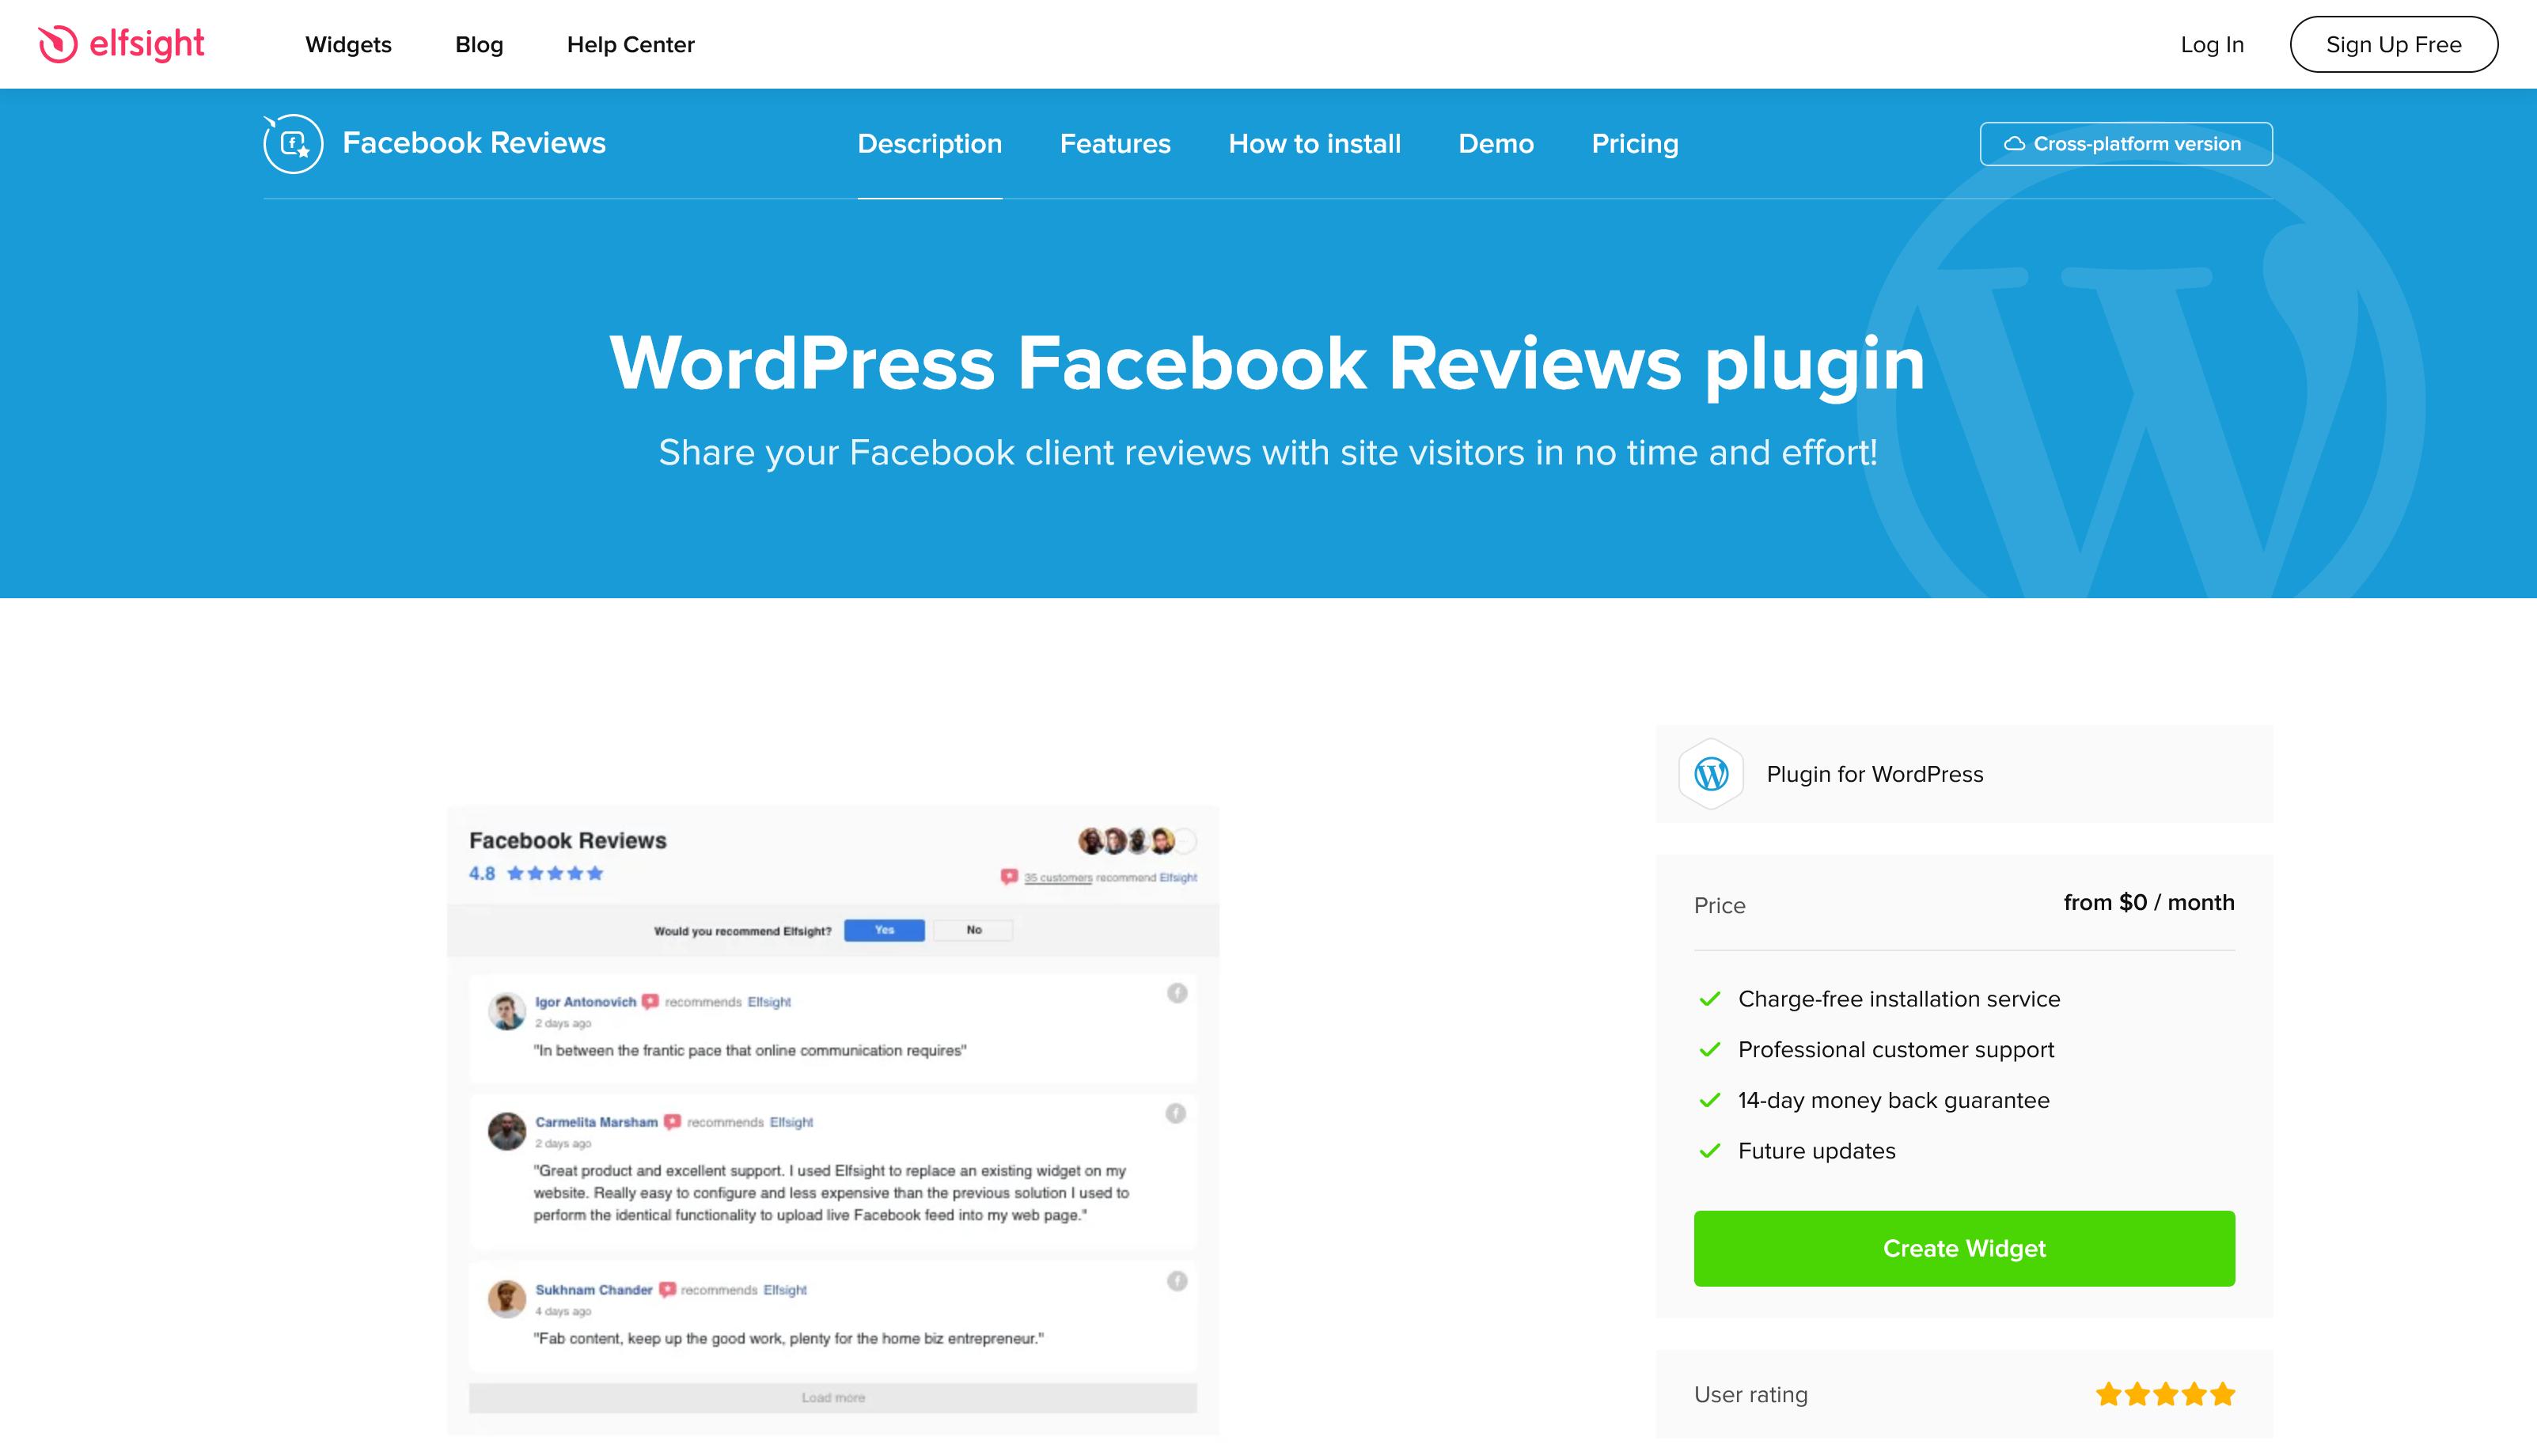 Facebook Reviews 1.2.5 – WordPress Facebook Reviews plugin